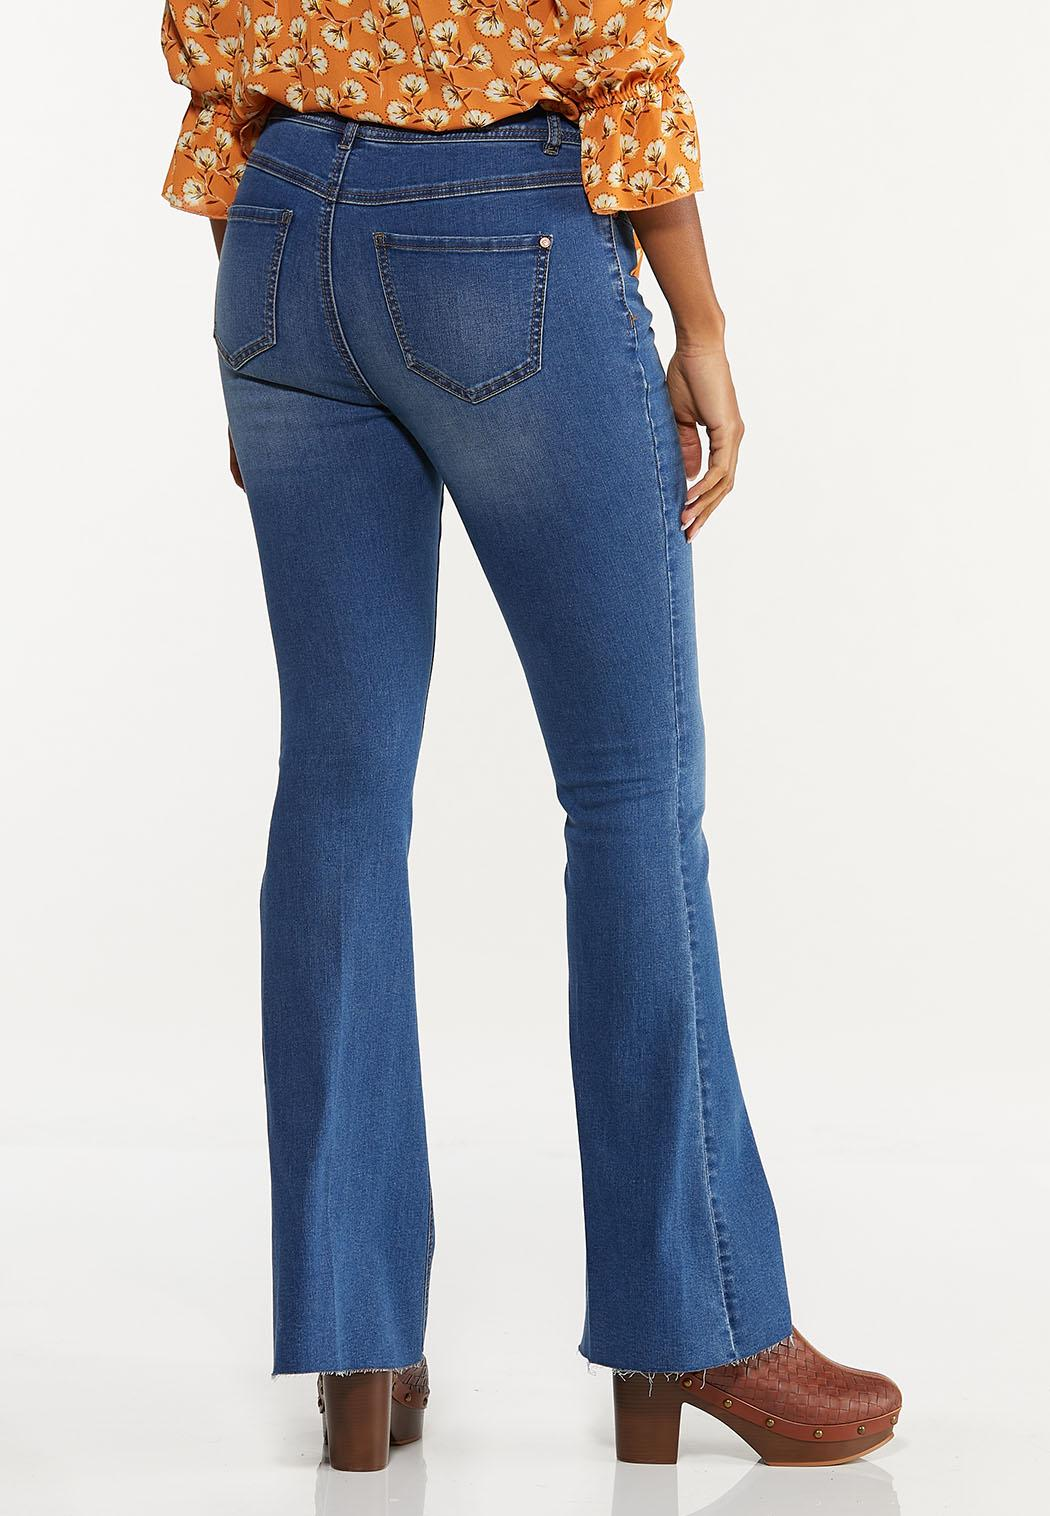 Petite Raw Edge Flare Jeans (Item #44662626)